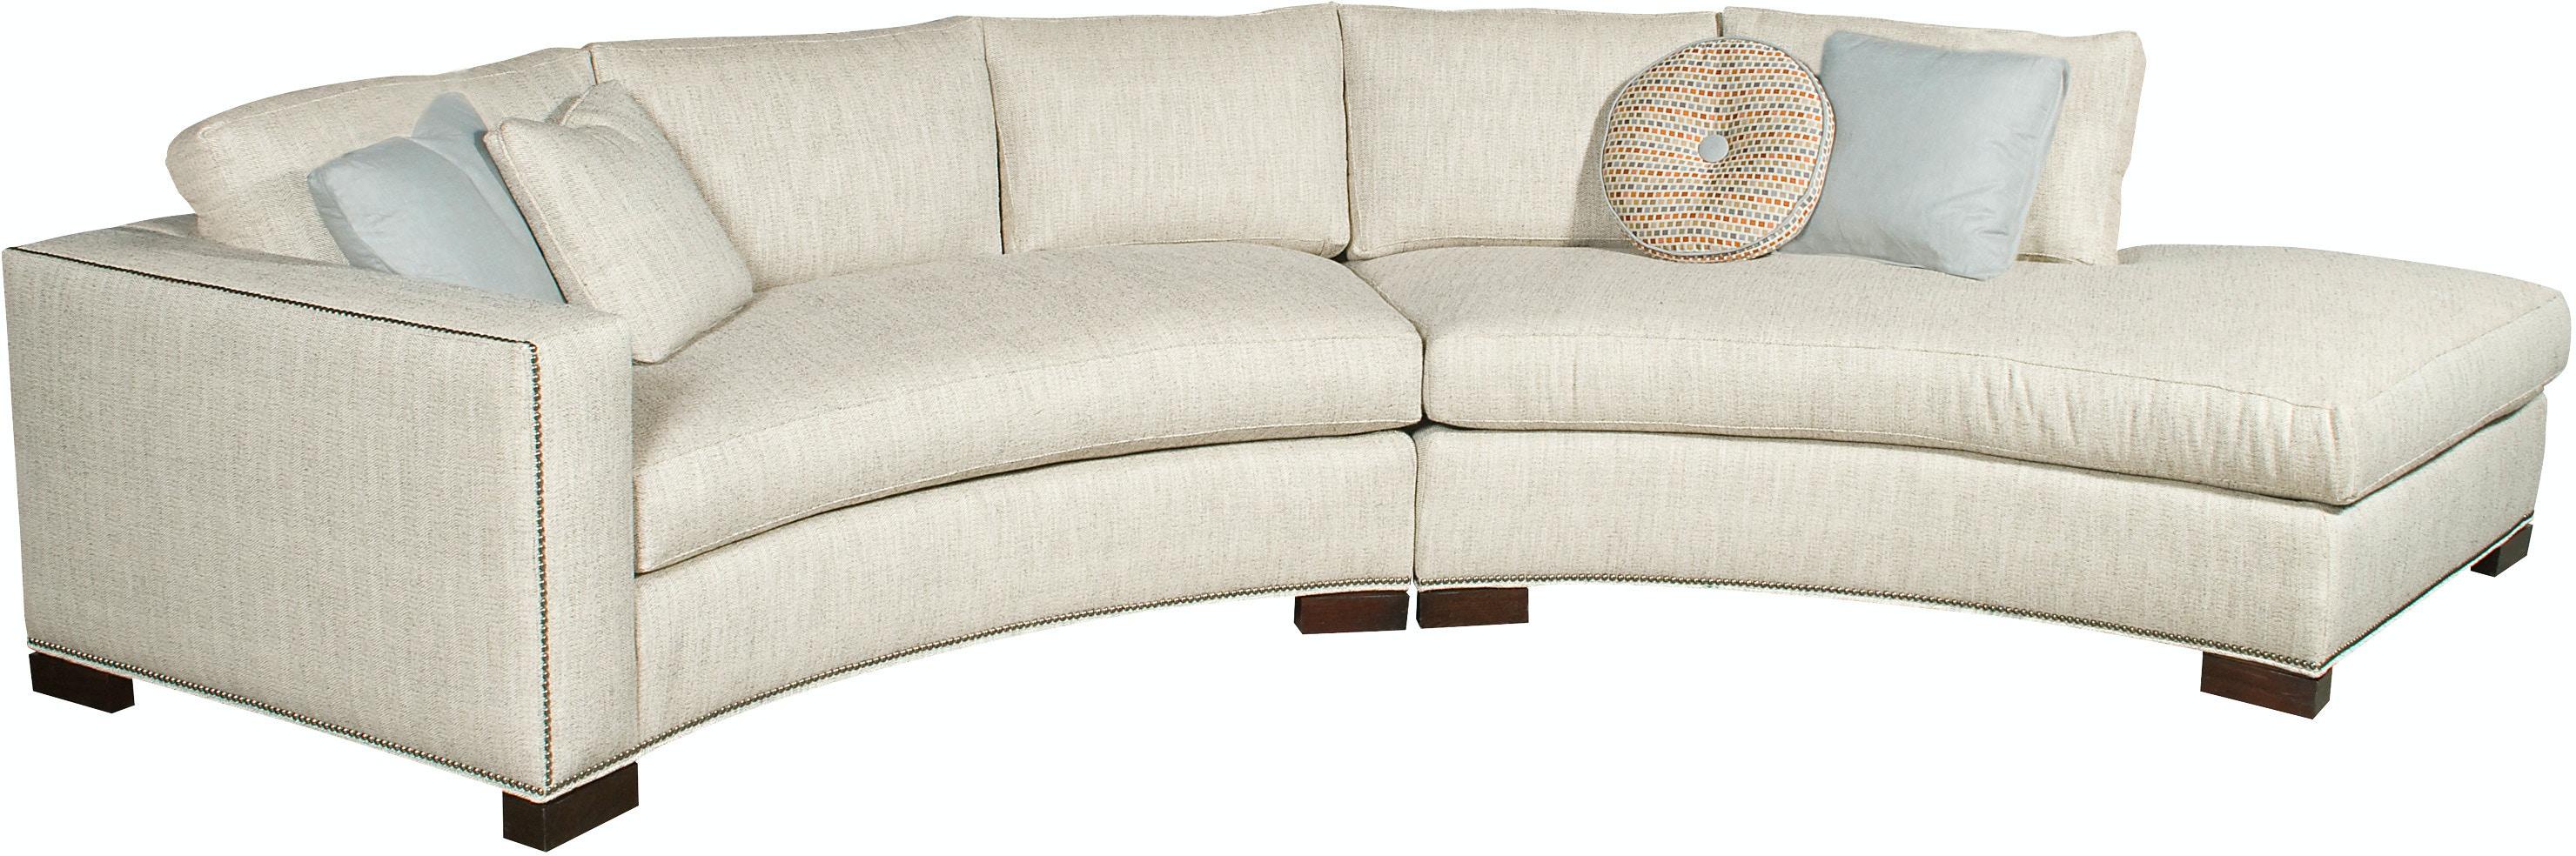 Vanguard Furniture W180 LAJ Living Room Bennett Left Arm Curved Sofa